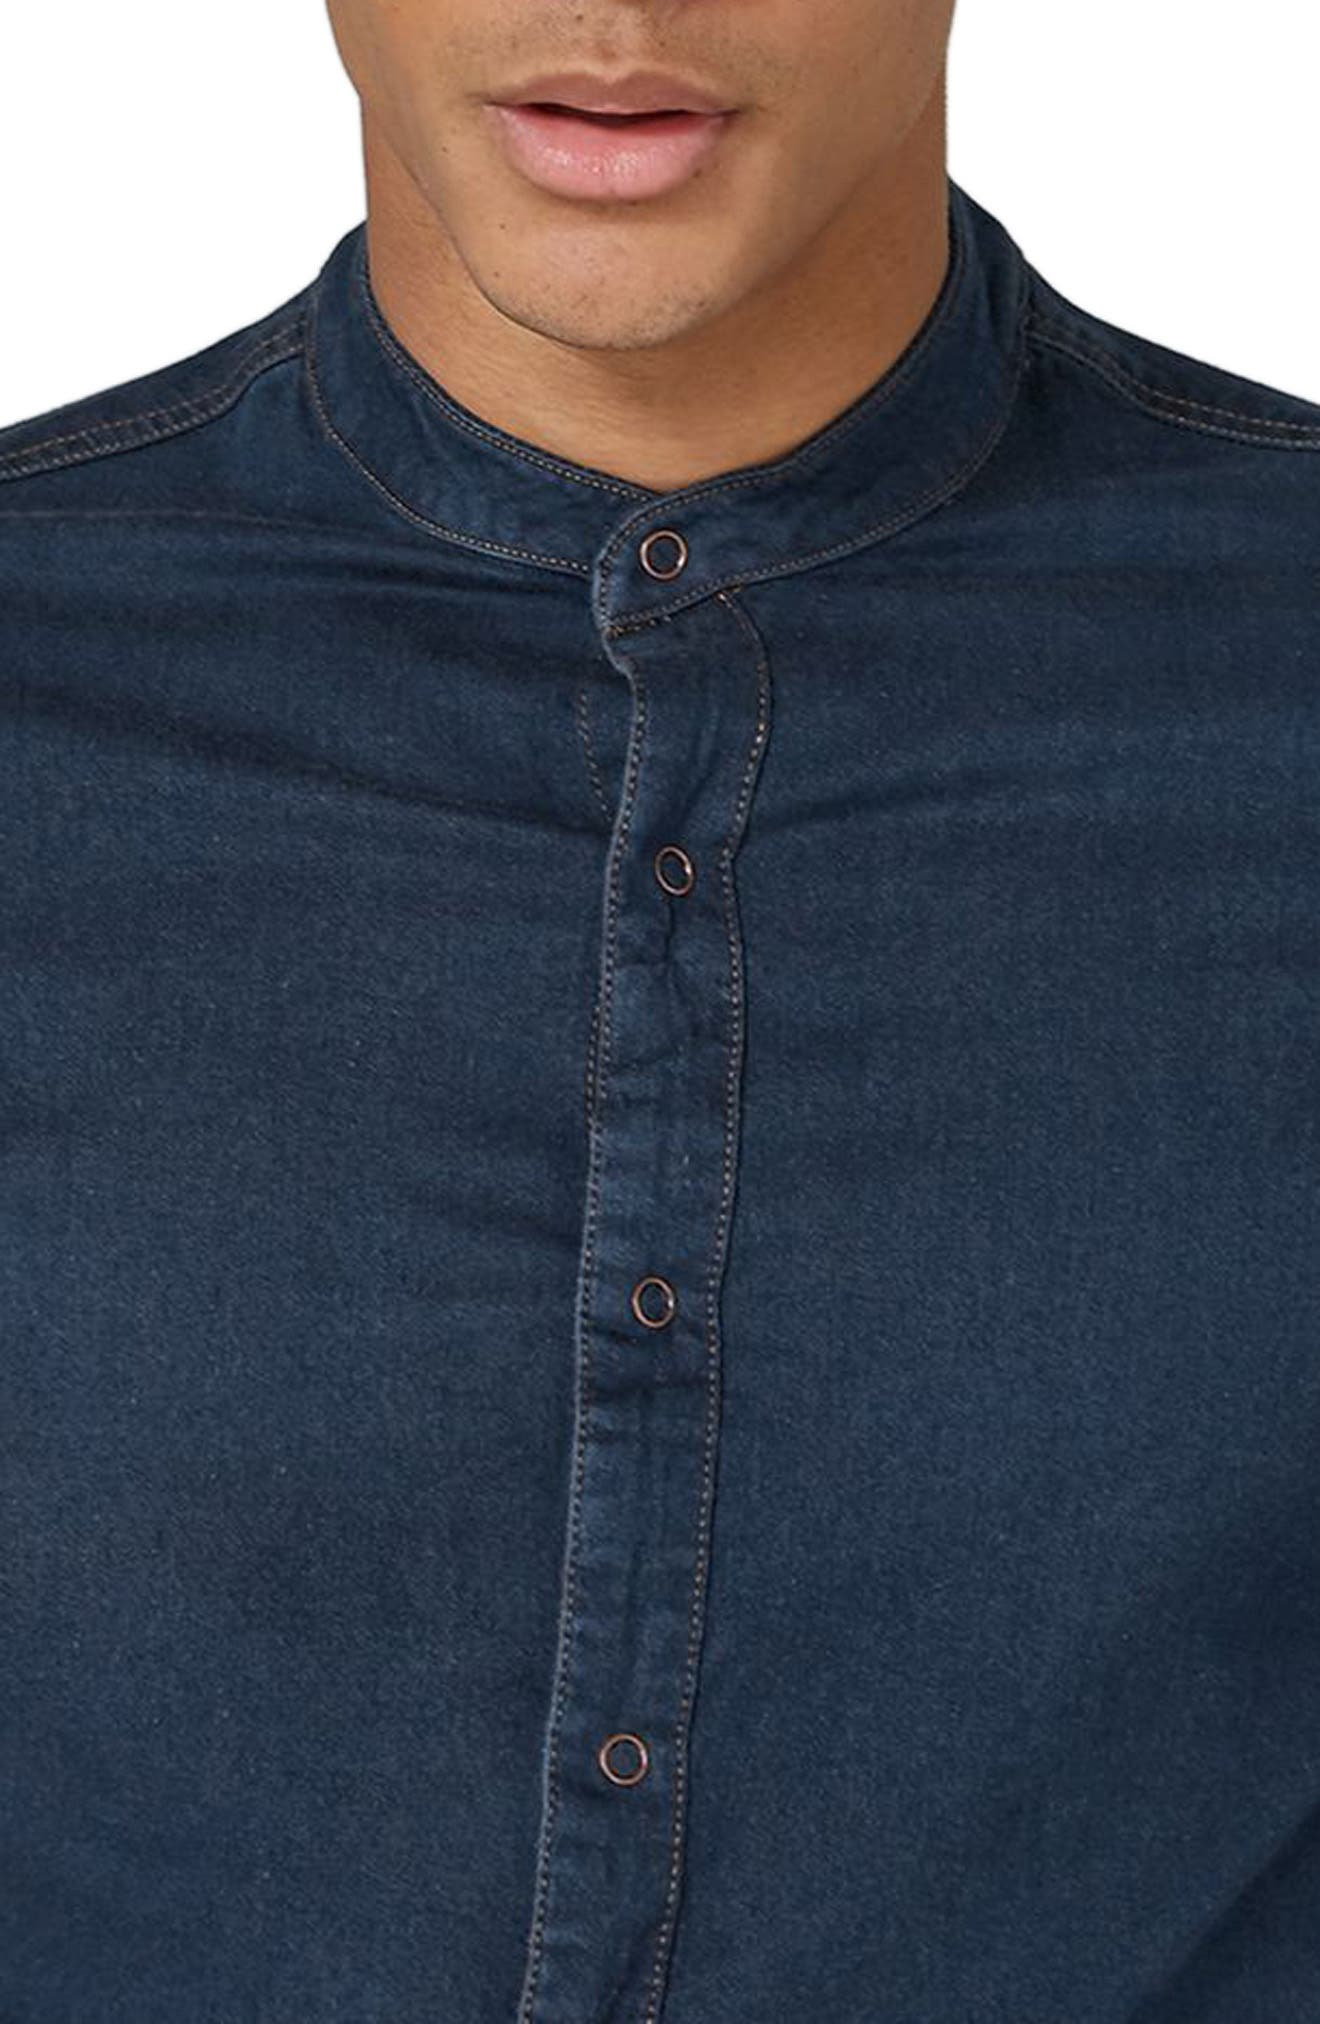 Band Collar Denim Shirt,                             Alternate thumbnail 4, color,                             Blue